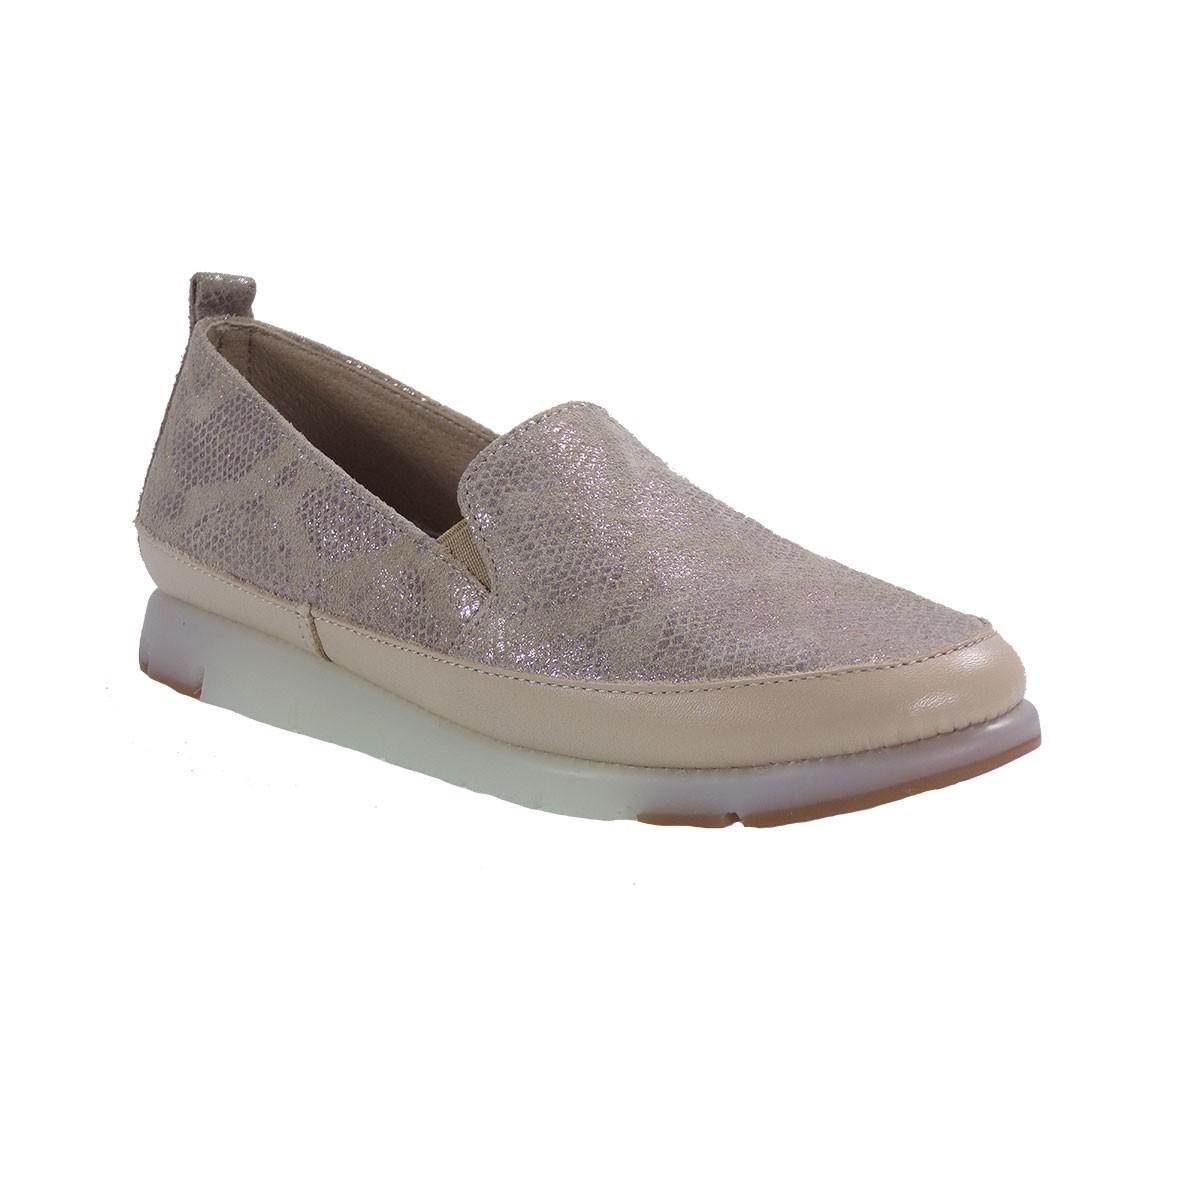 Aerosoles Shoes Γυναικεία Παπούτσια FAST LANE 887282222 Μπεζ Δέρμα